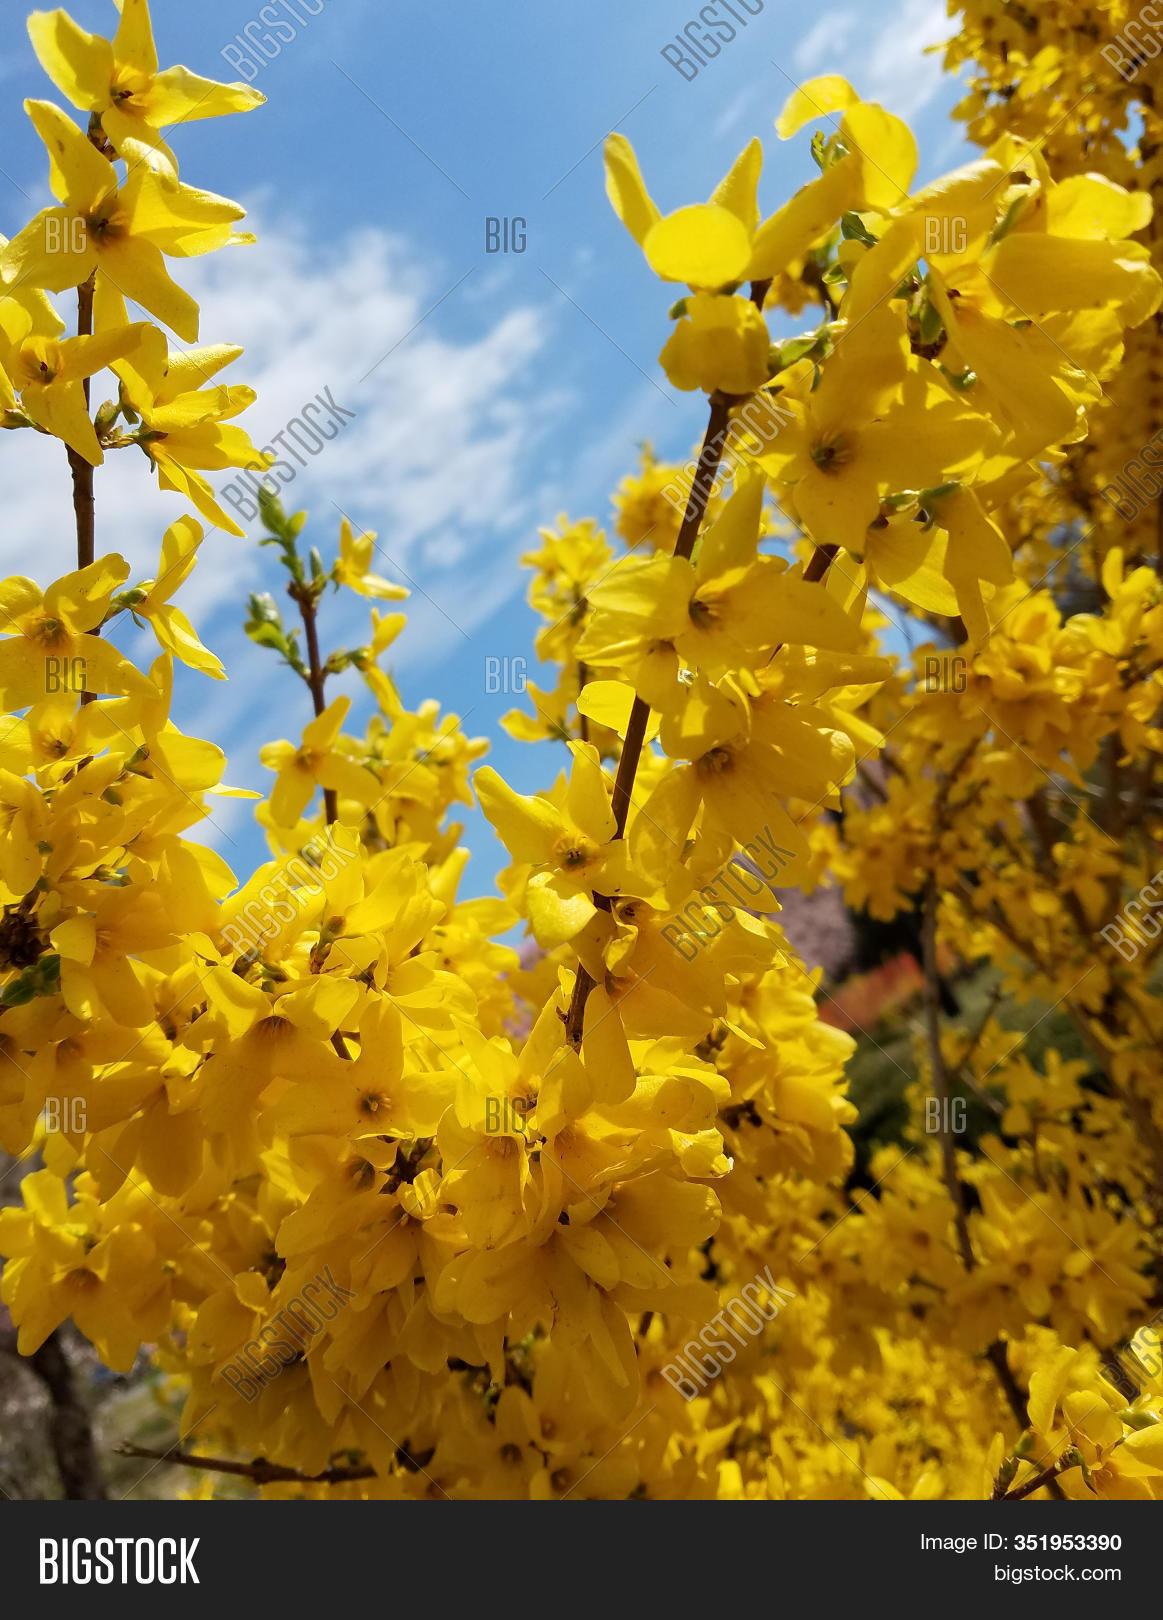 Yellow Bushes Image Photo Free Trial Bigstock